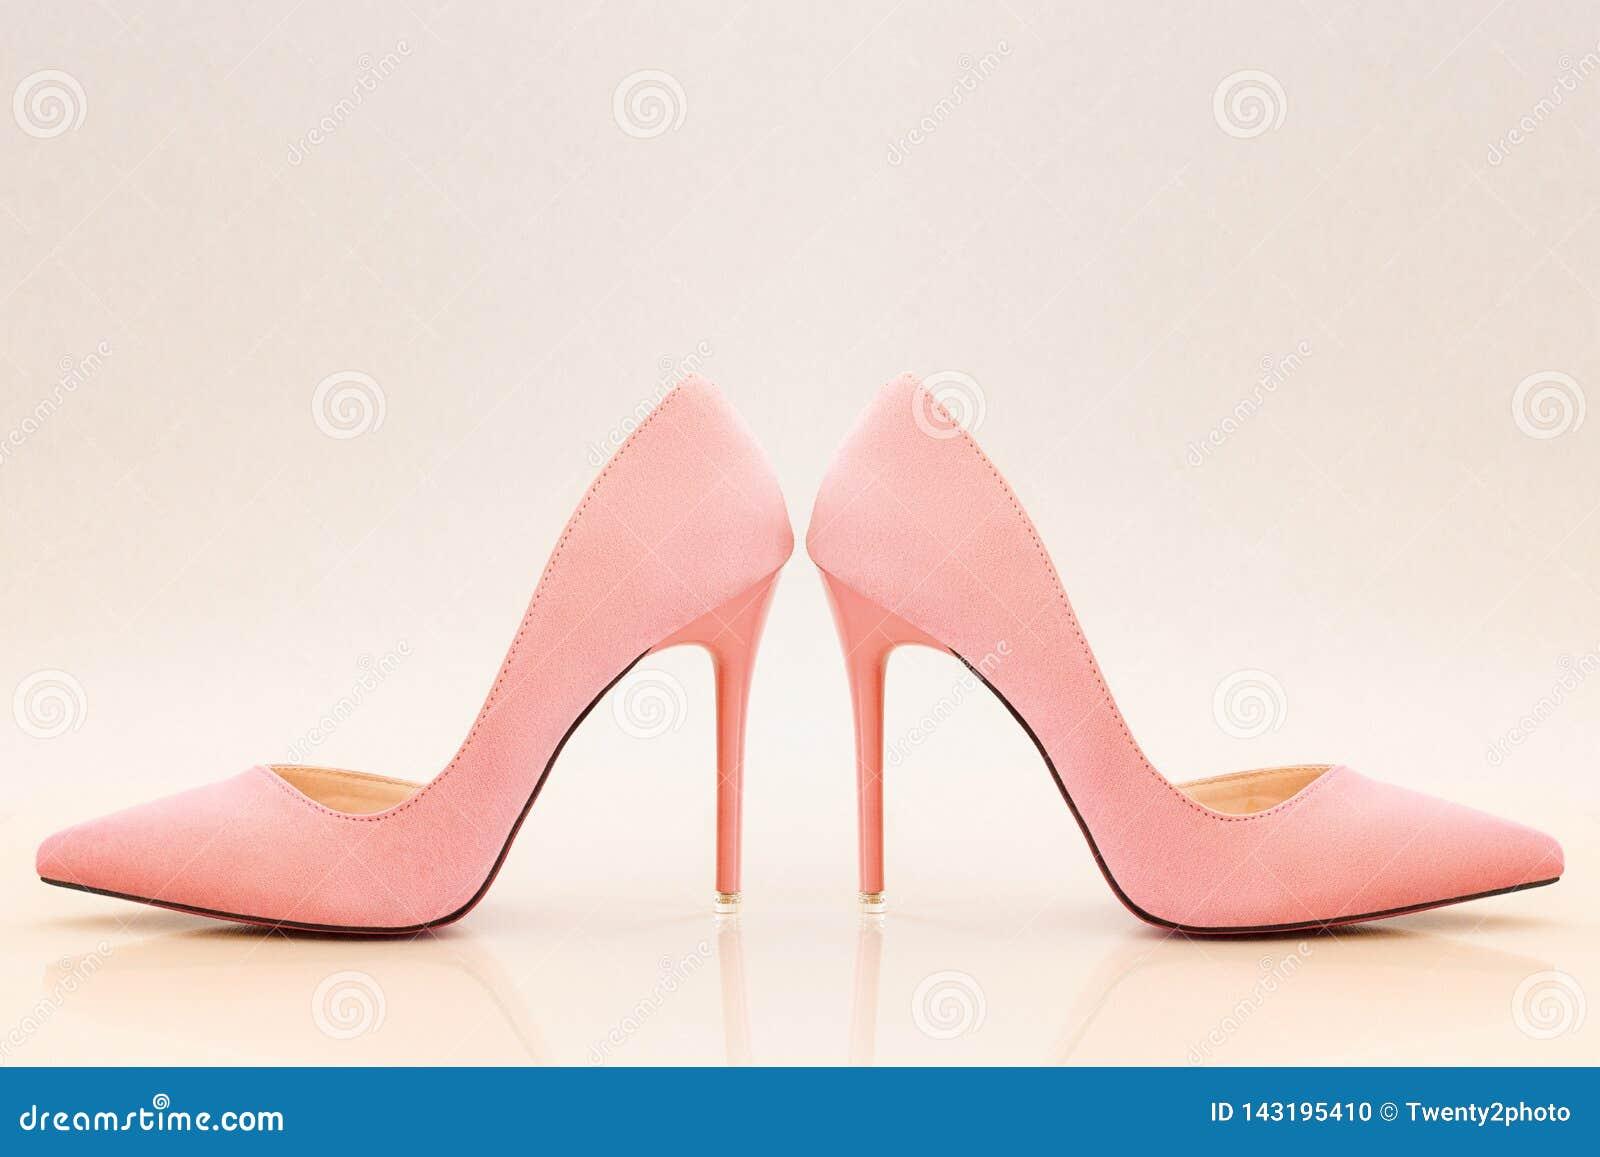 light peach heels